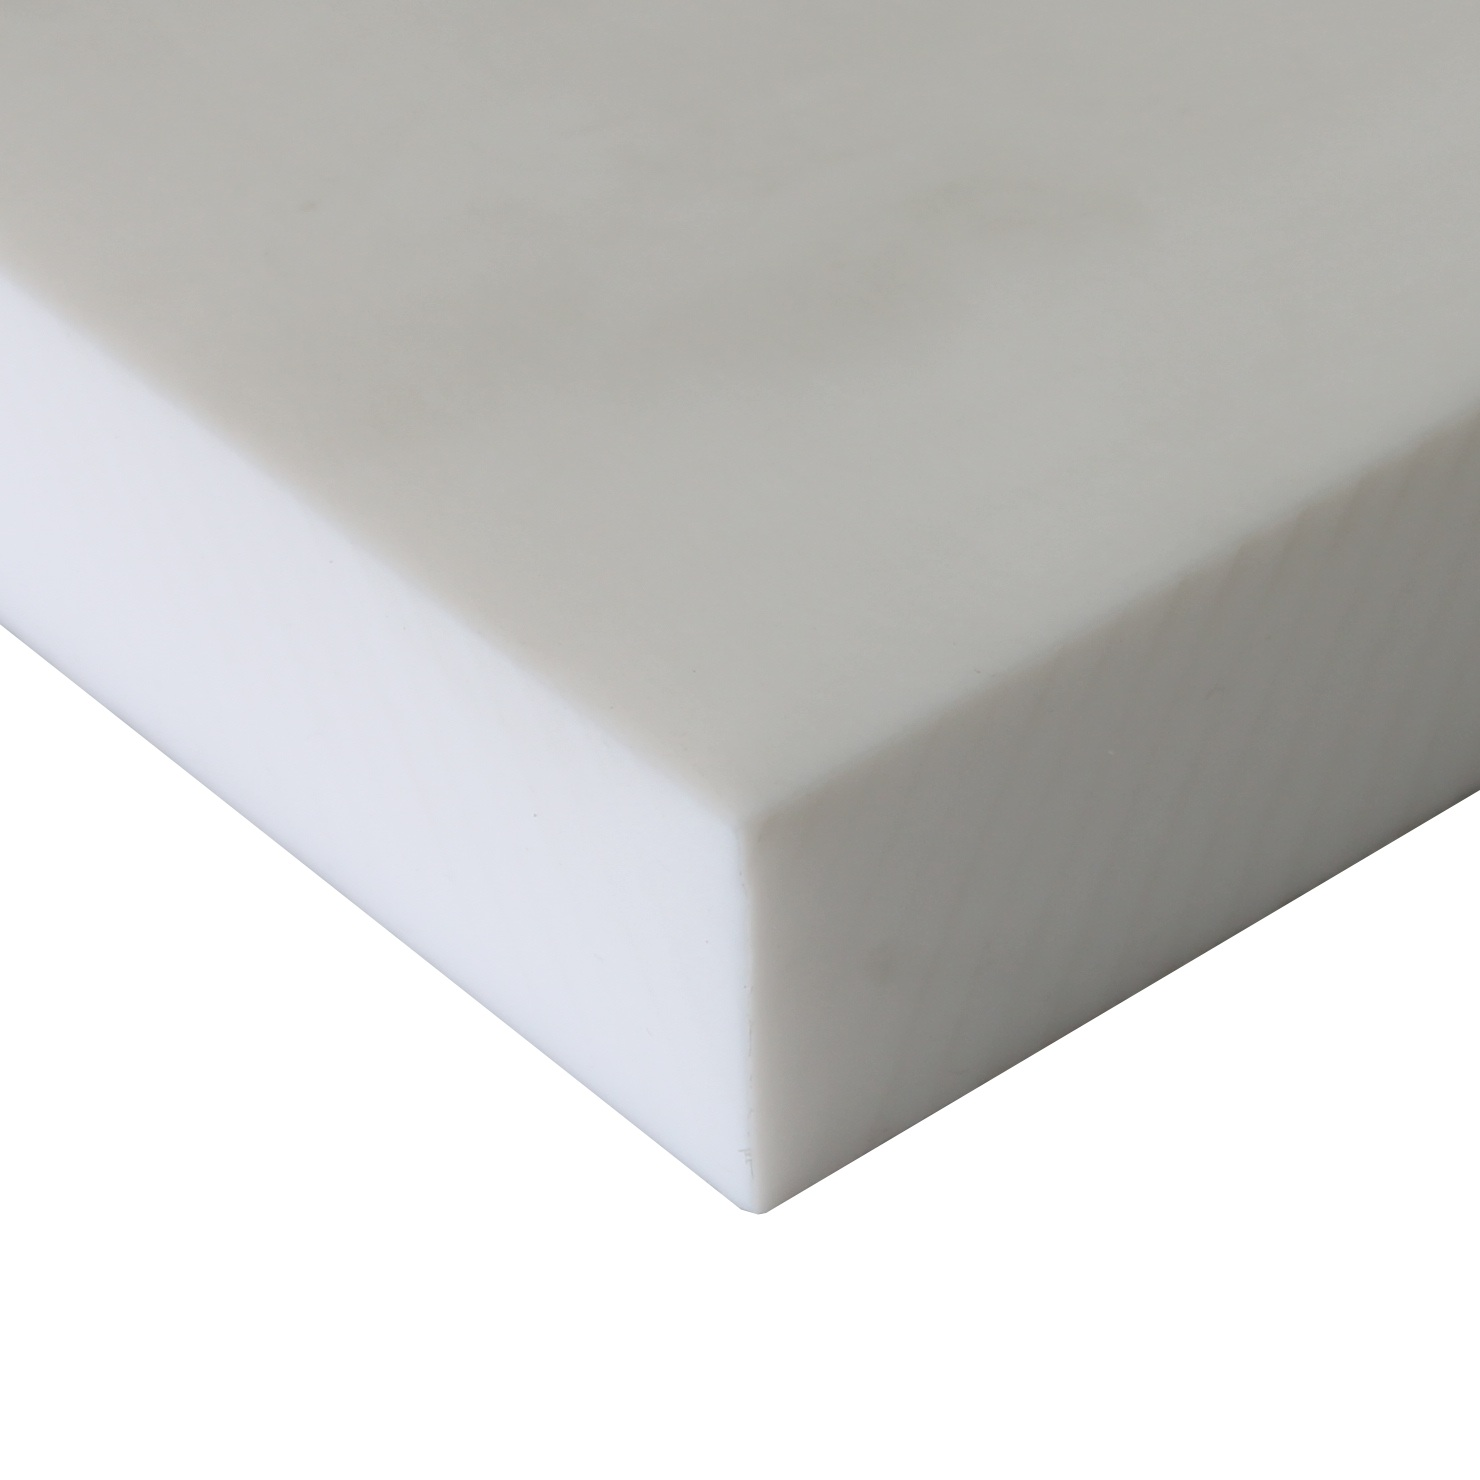 SHEET PLASTICS -